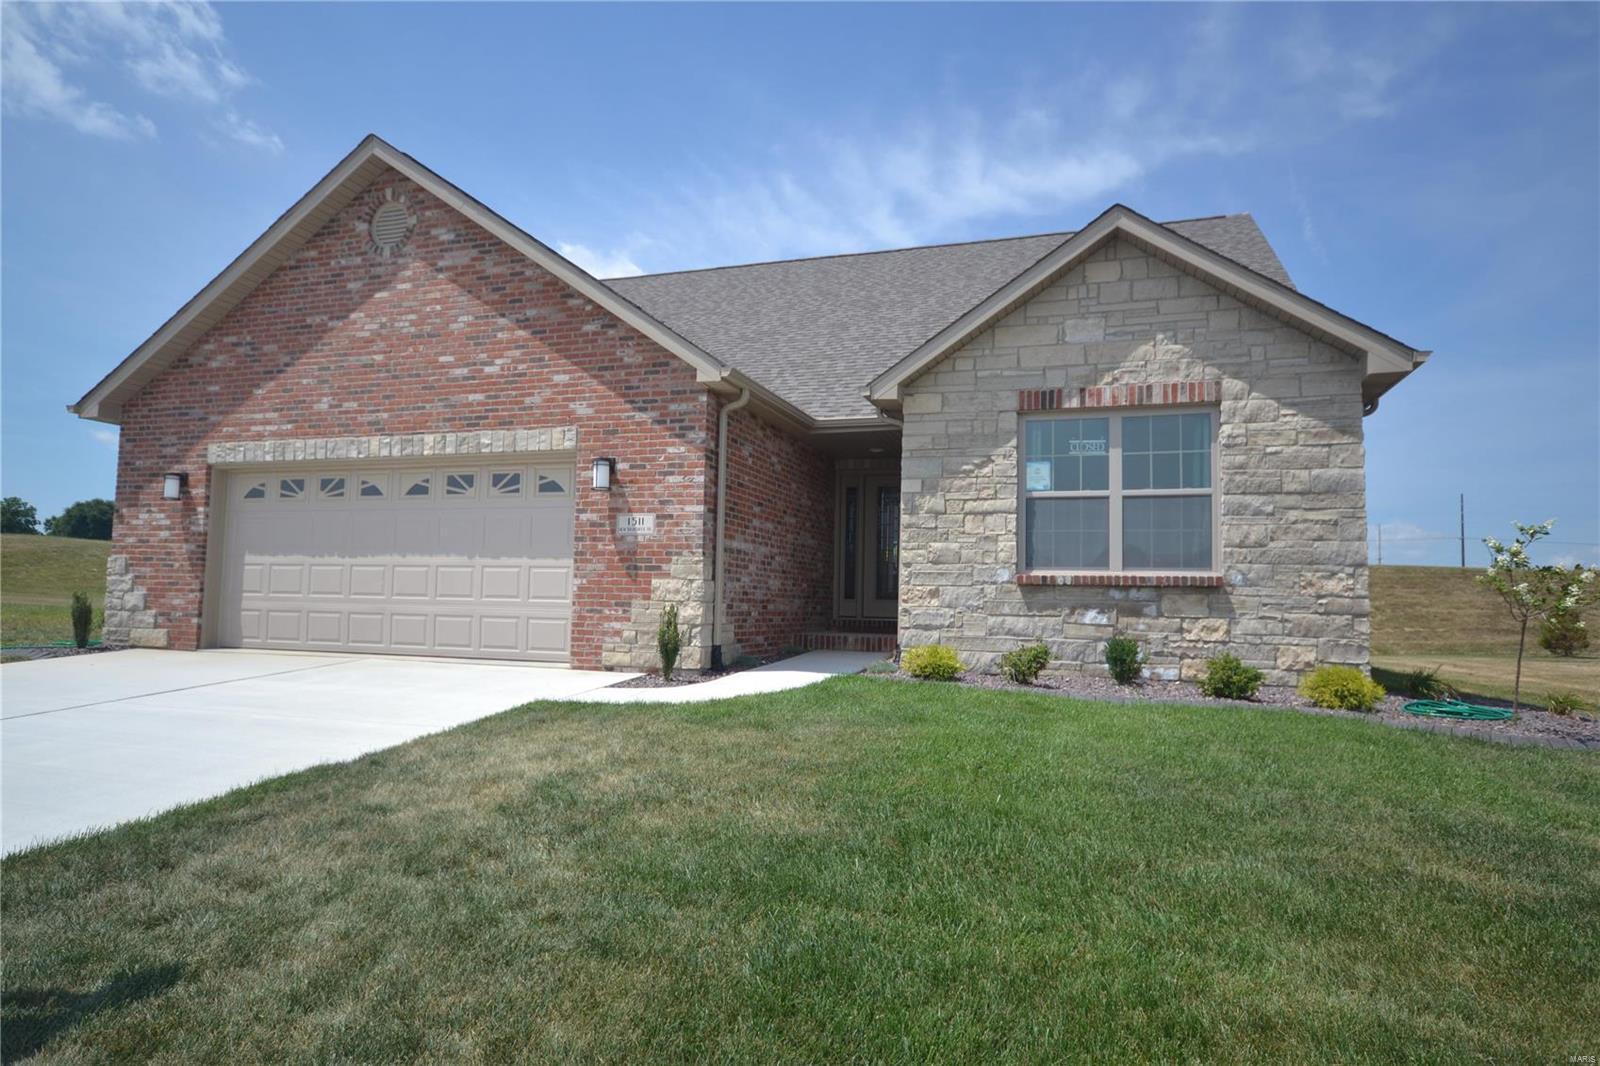 4405 TBB Devin Drive Property Photo - Smithton, IL real estate listing